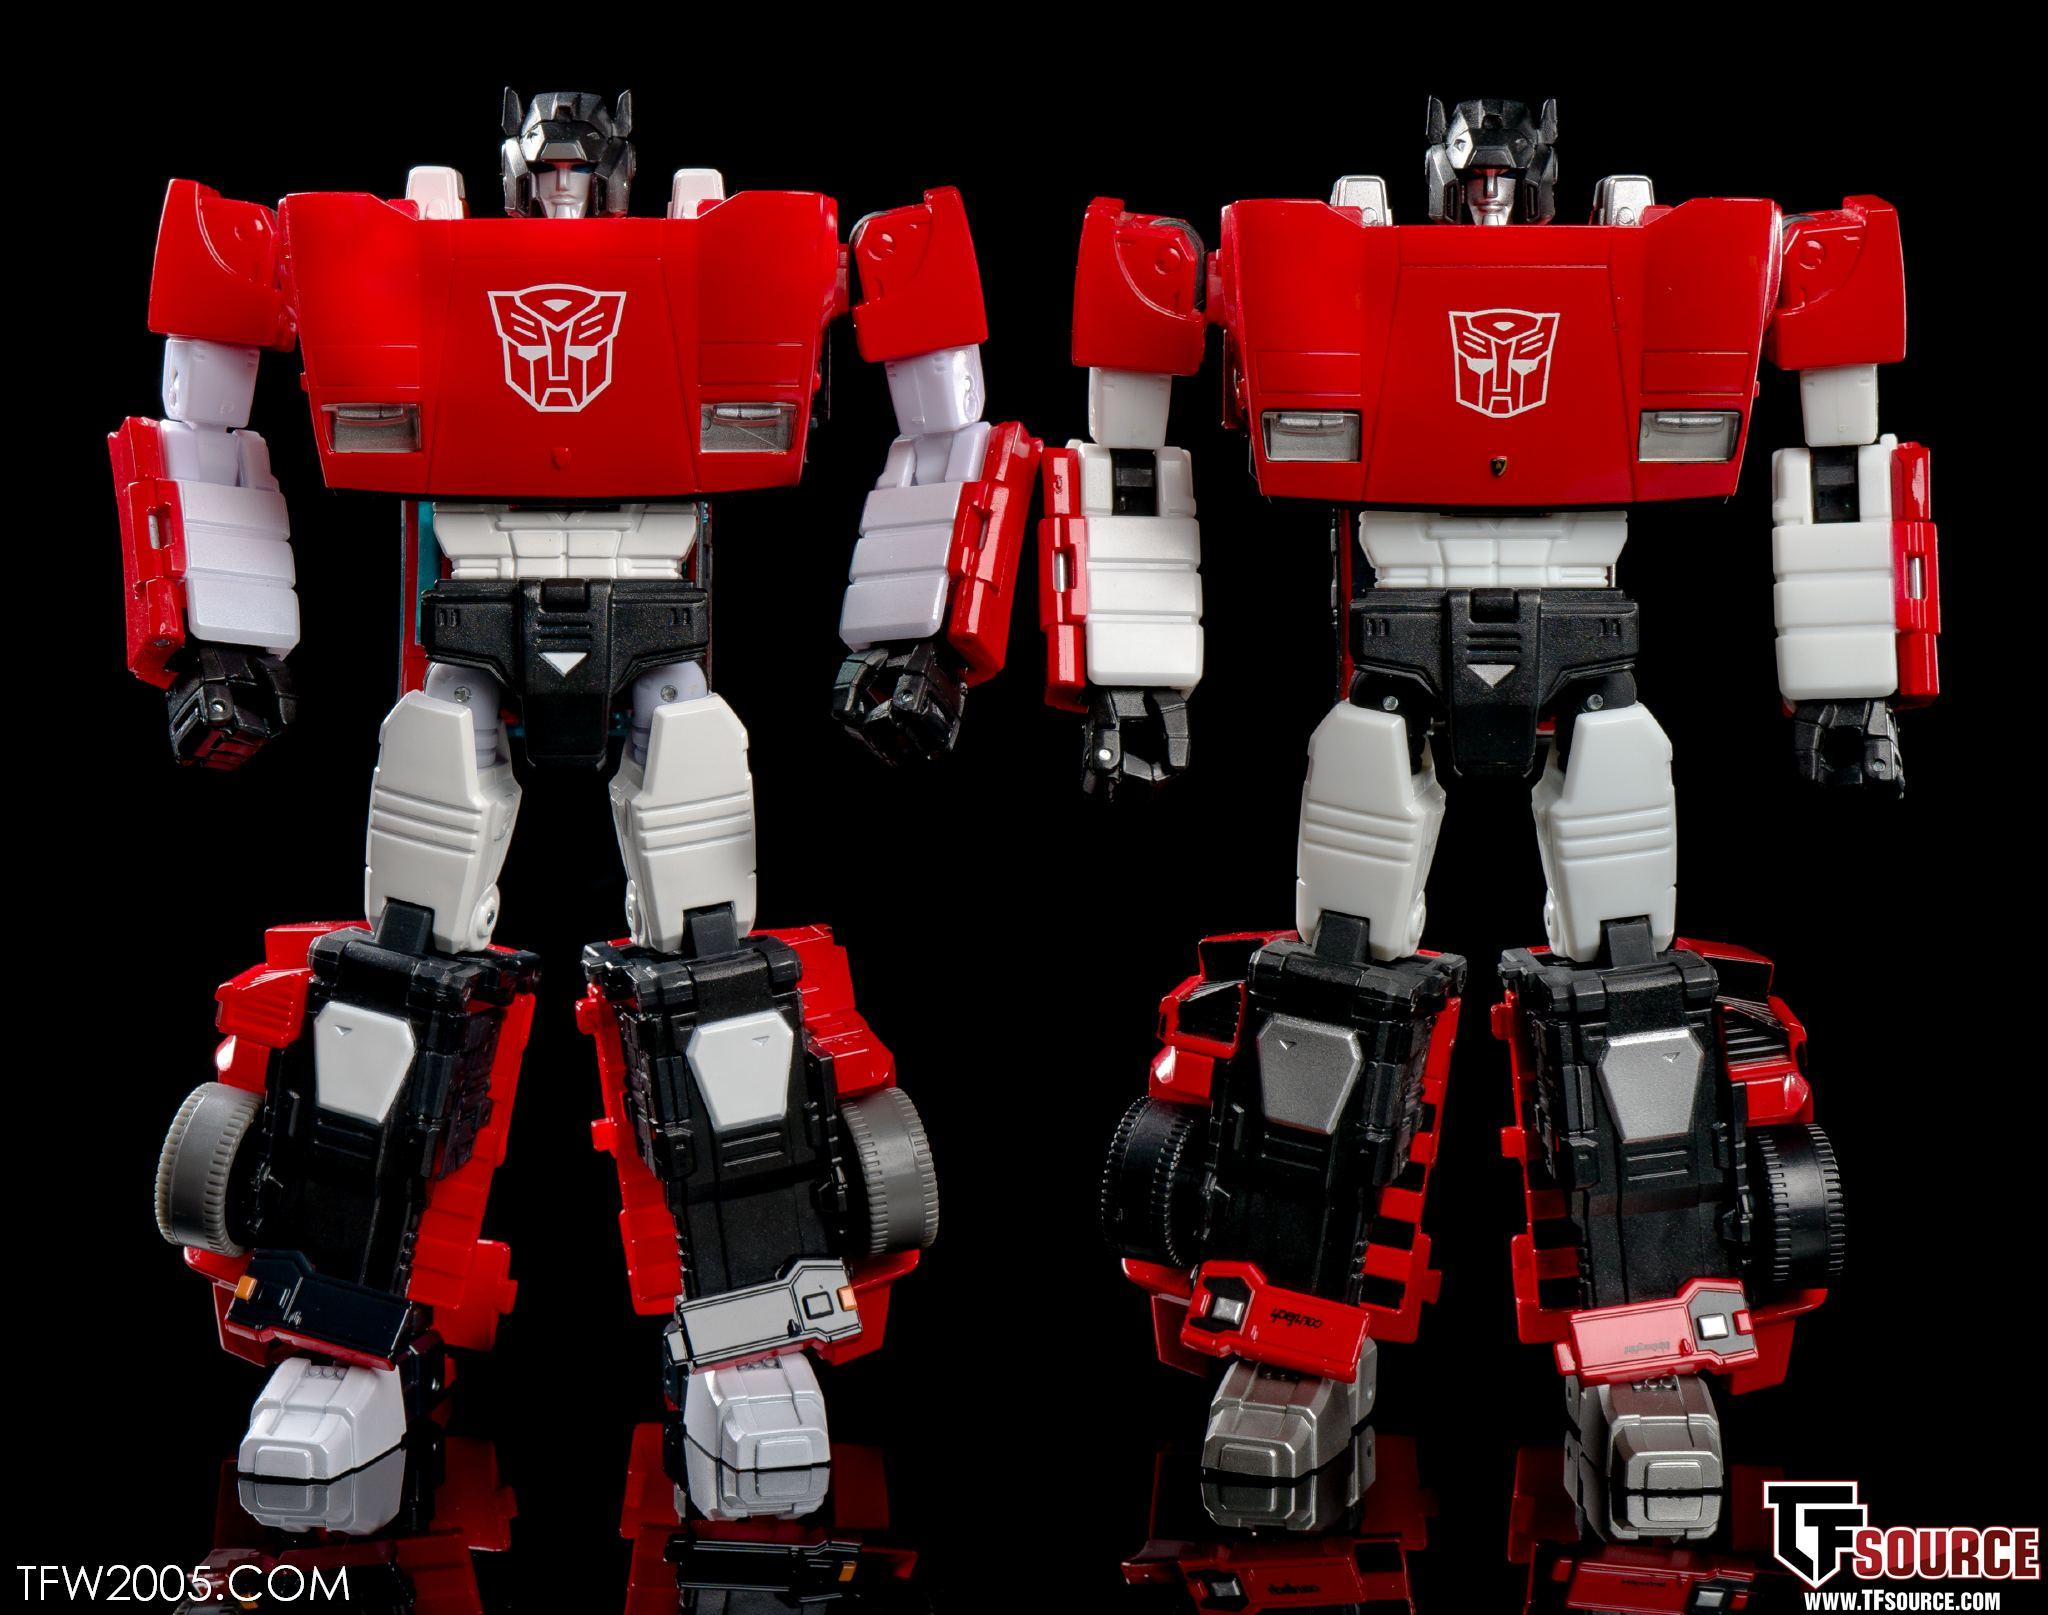 MP12+ Masterpiece Sideswipe (Lambor) Gallery ... Transformers 3 Bumblebee Vs Megatron